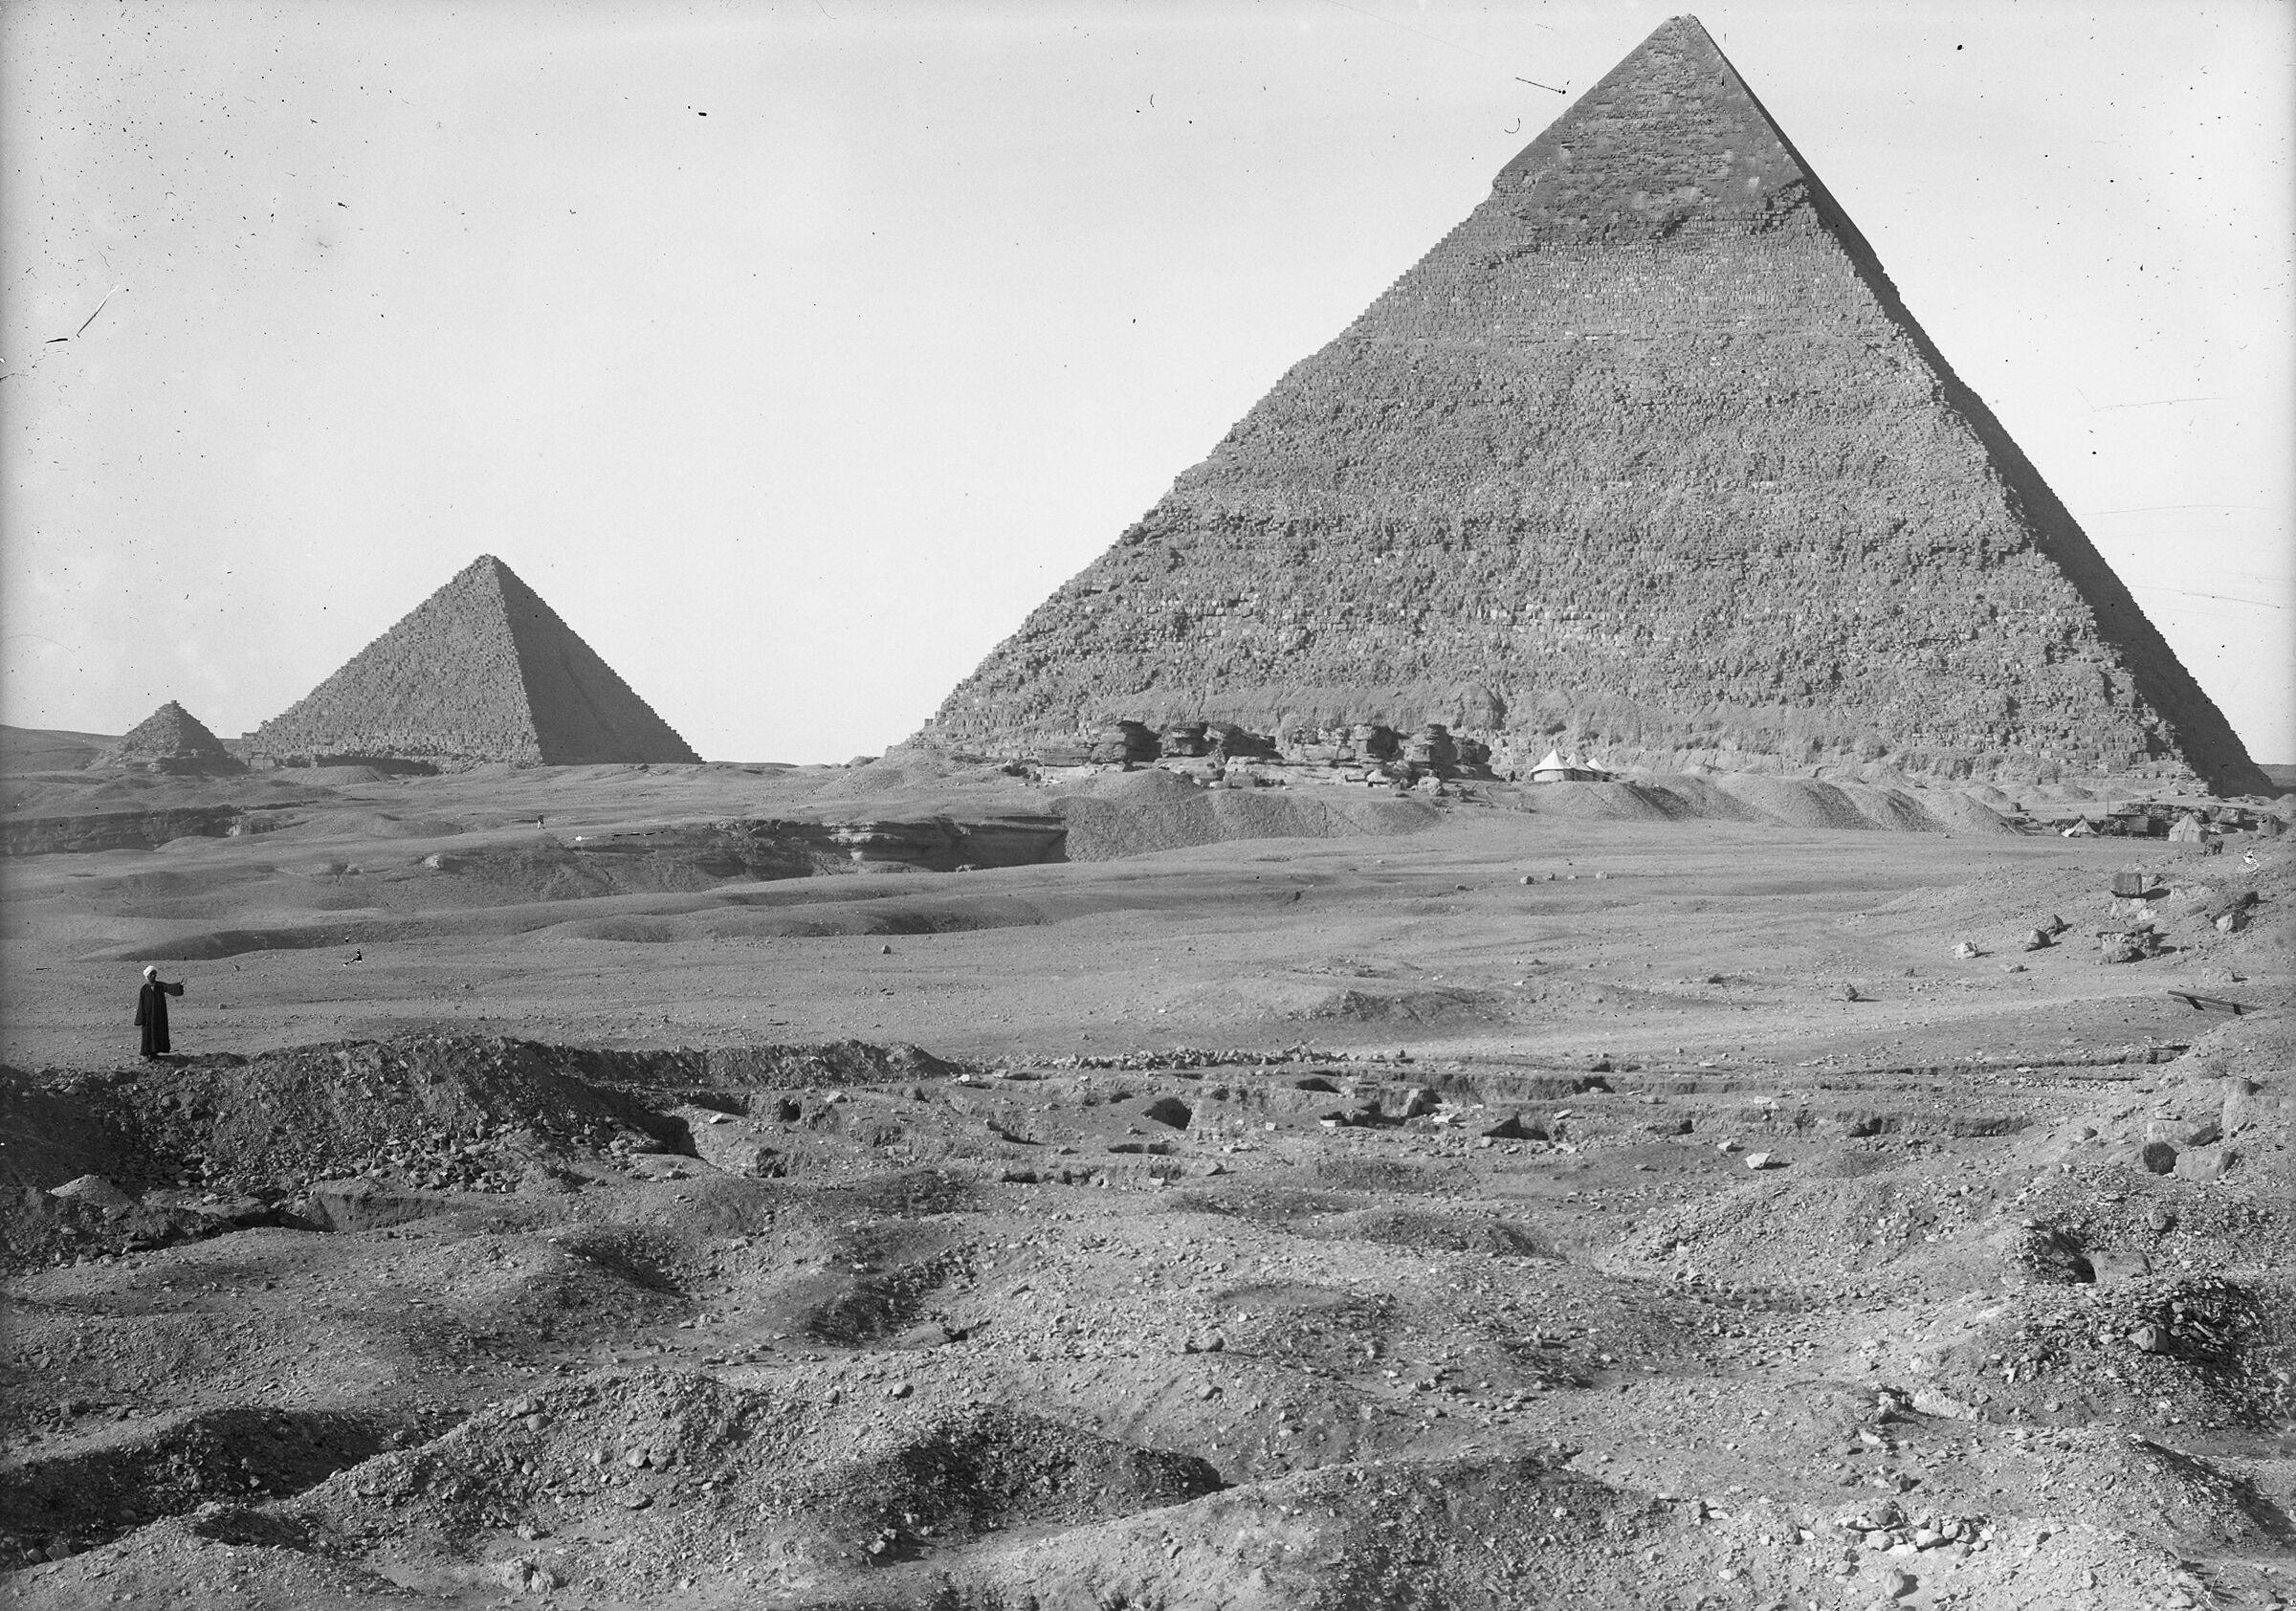 Eastern Cemetery: Site: Giza; View: Khafre pyramid, Menkaure pyramid